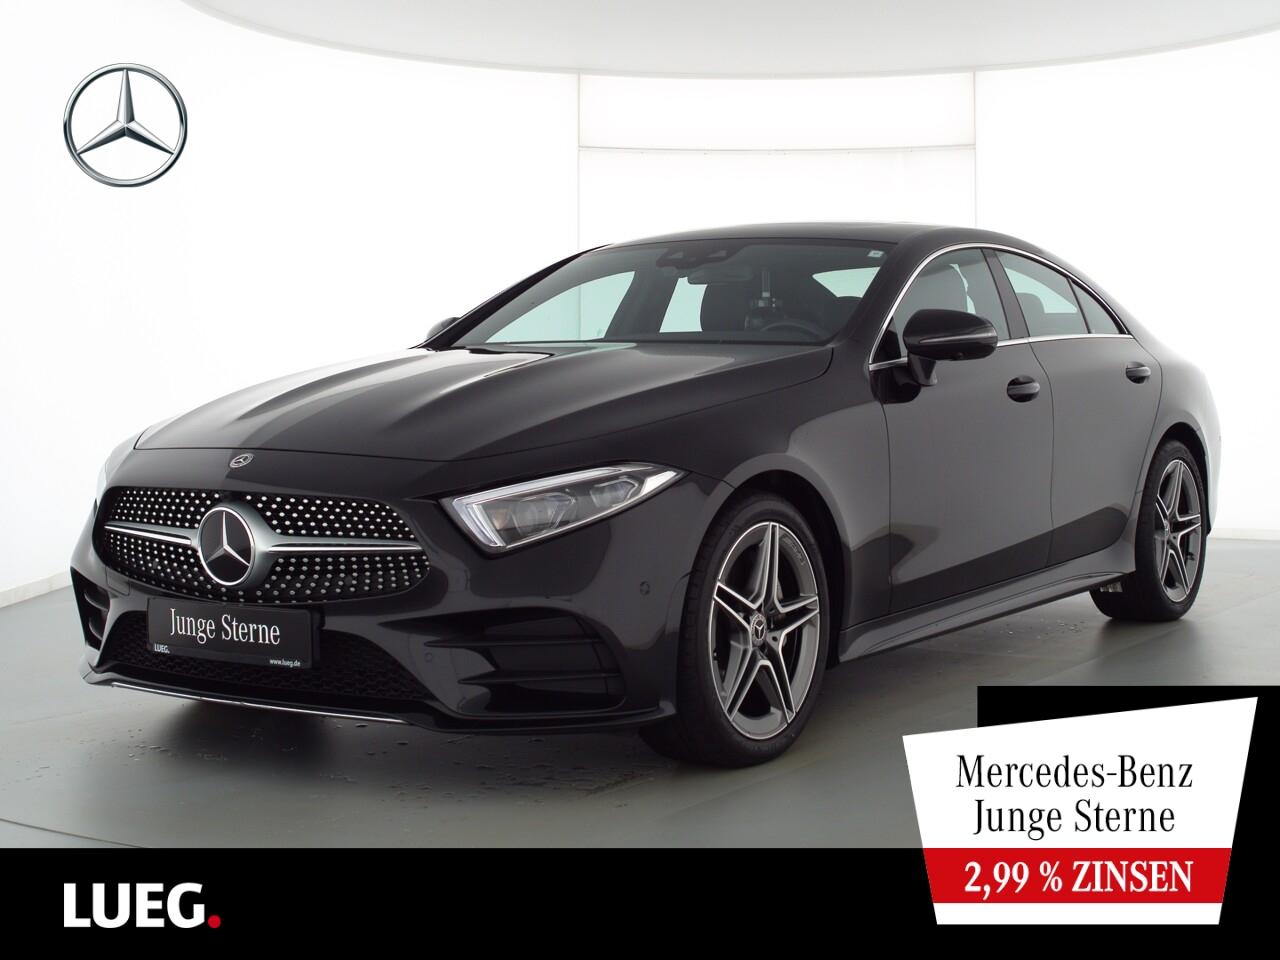 Mercedes-Benz CLS 400 d 4M AMG+MBUXHighE+SHD+Mbeam+Distr+360°, Jahr 2020, Diesel